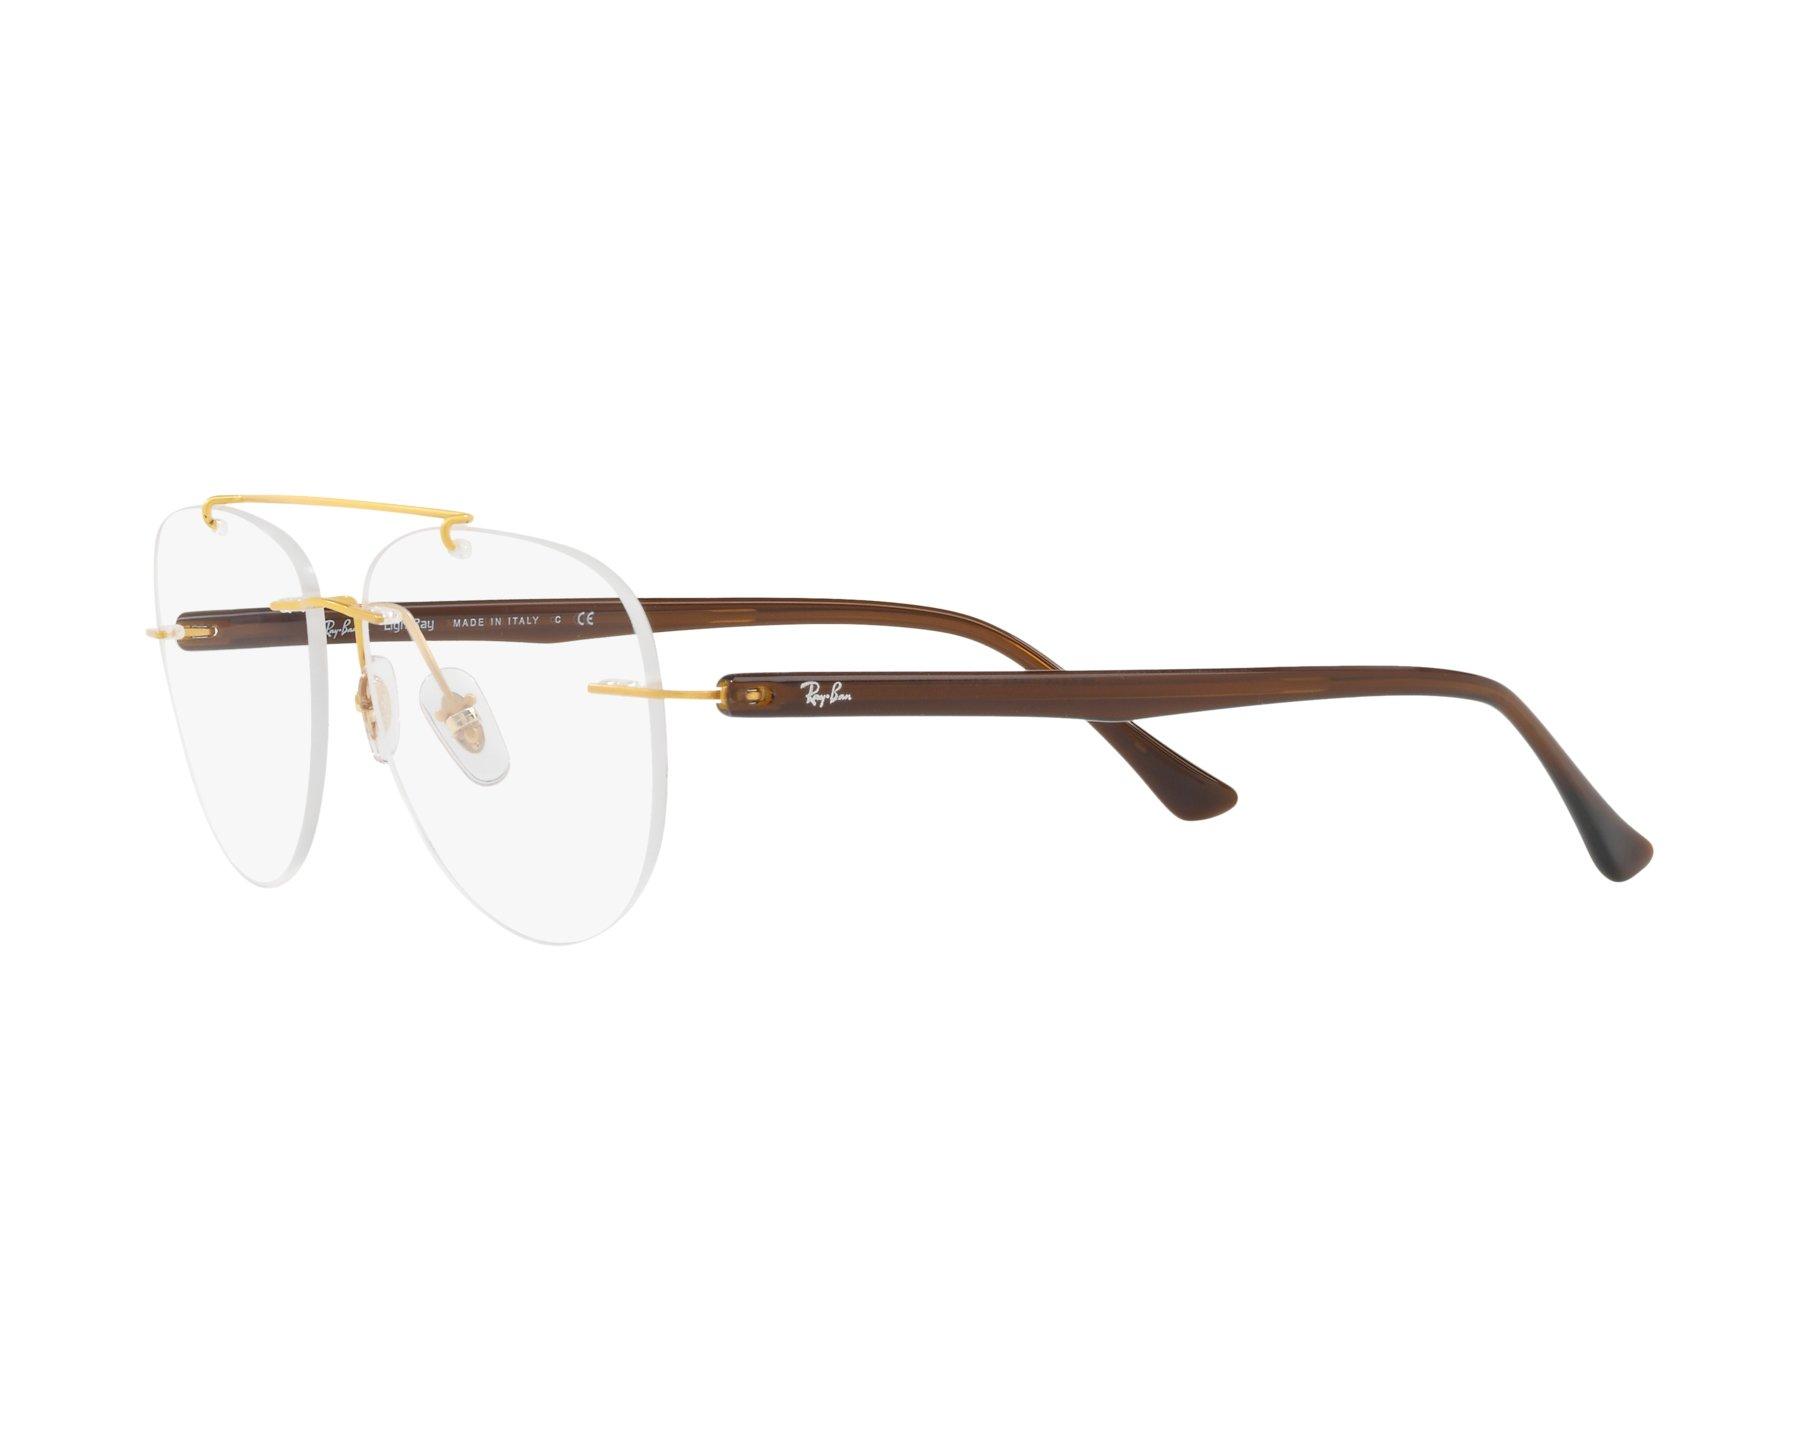 24f2dc2d2a eyeglasses Ray-Ban RX-8749 1194 - Gold Brown 360 degree view 3